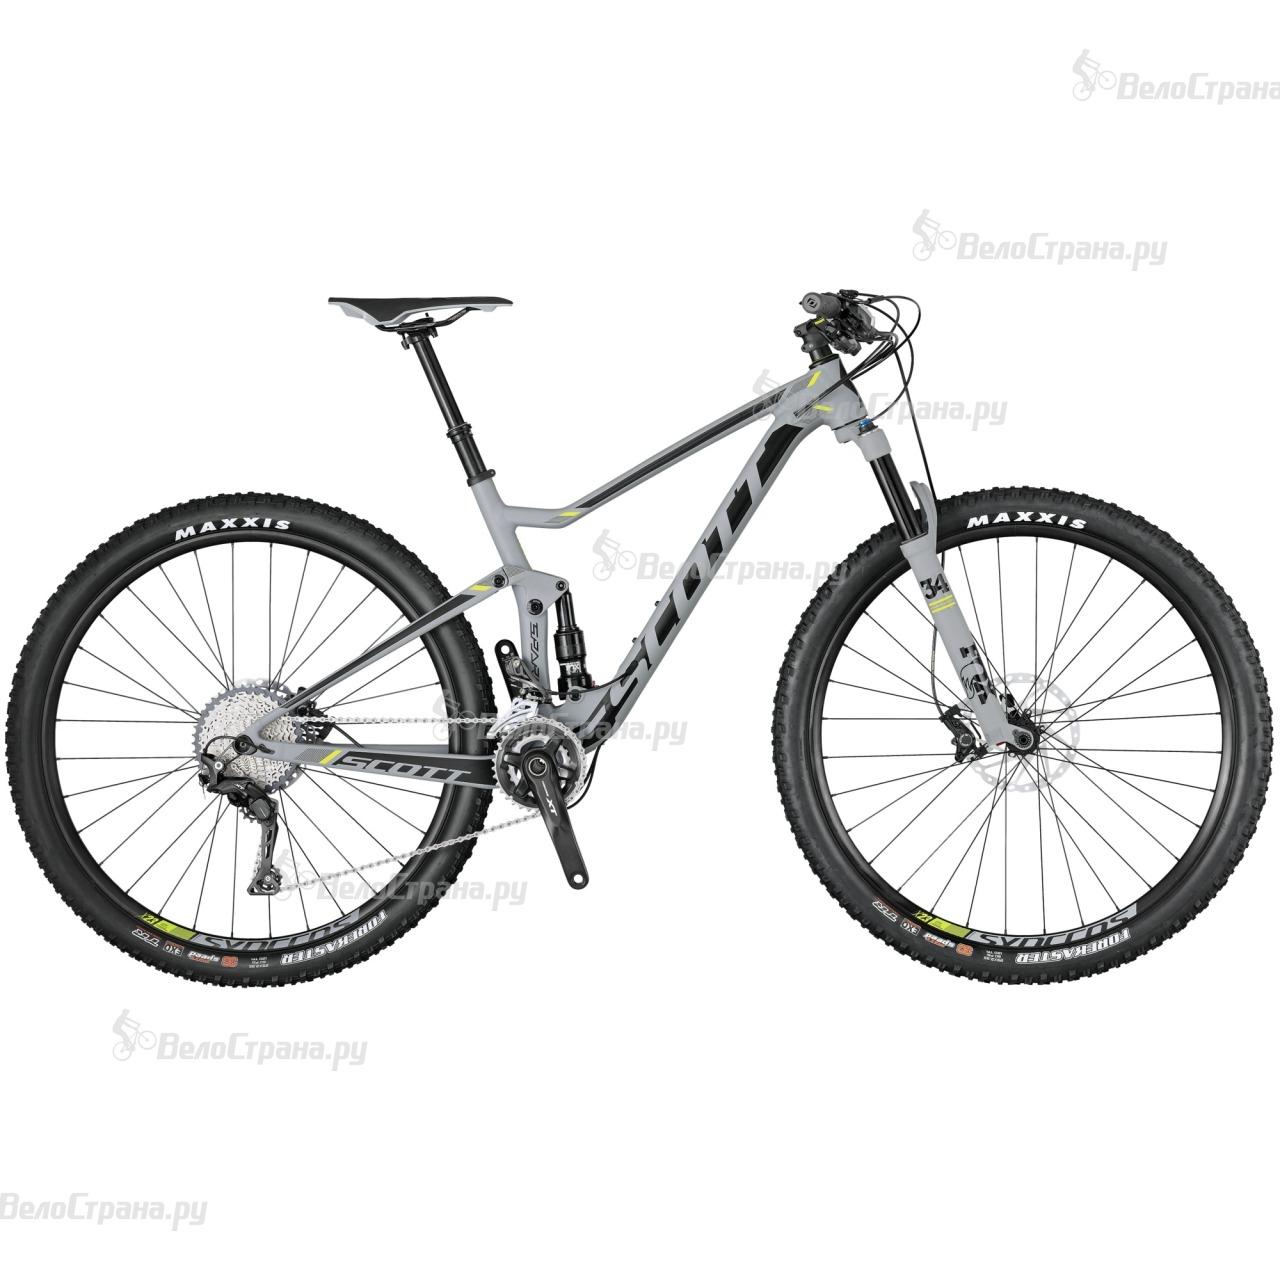 Велосипед Scott Spark 740 (2017) scott spark 740 2017